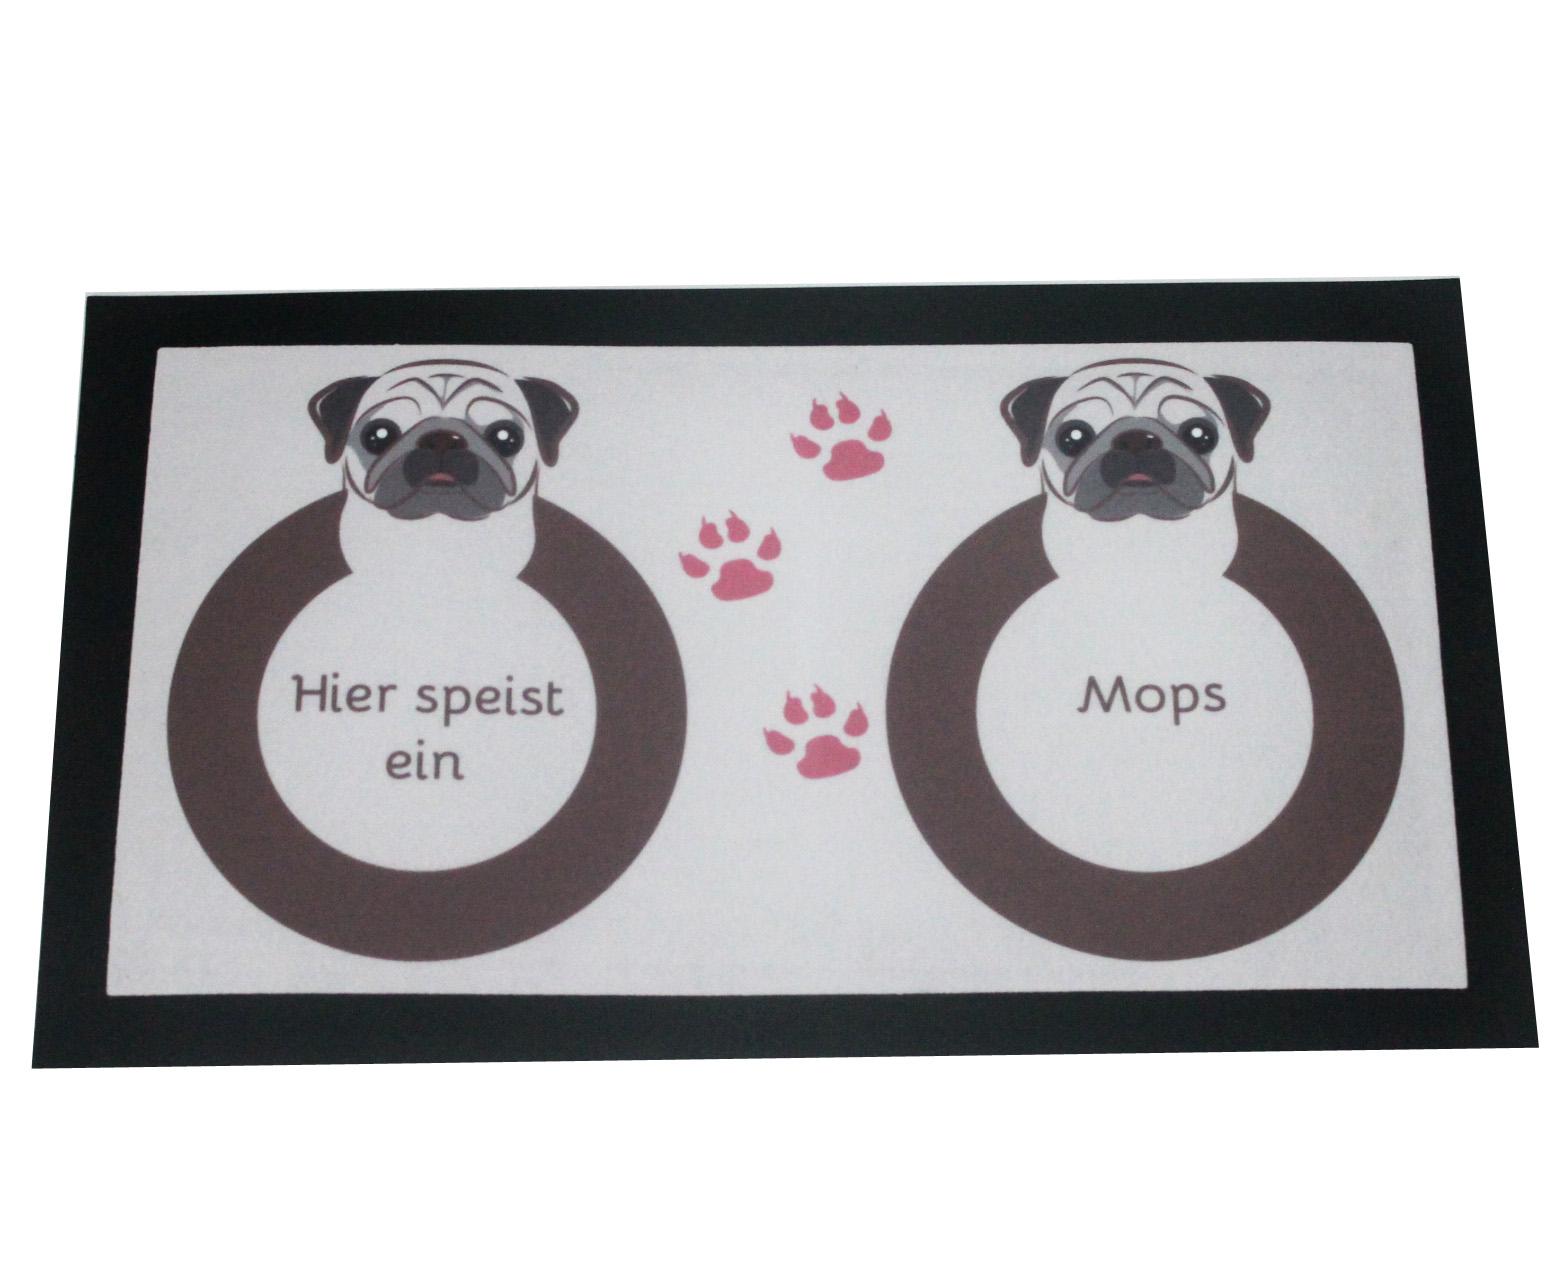 Napfunterlage Mops Hund